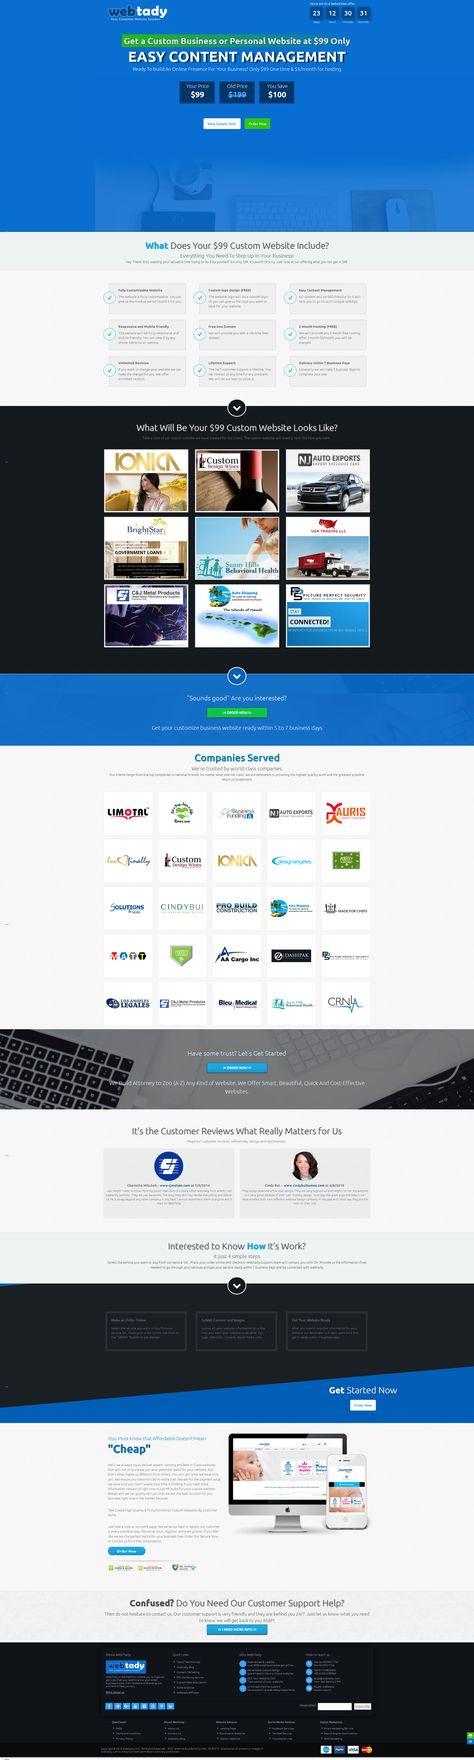 $99 Custom Website Design